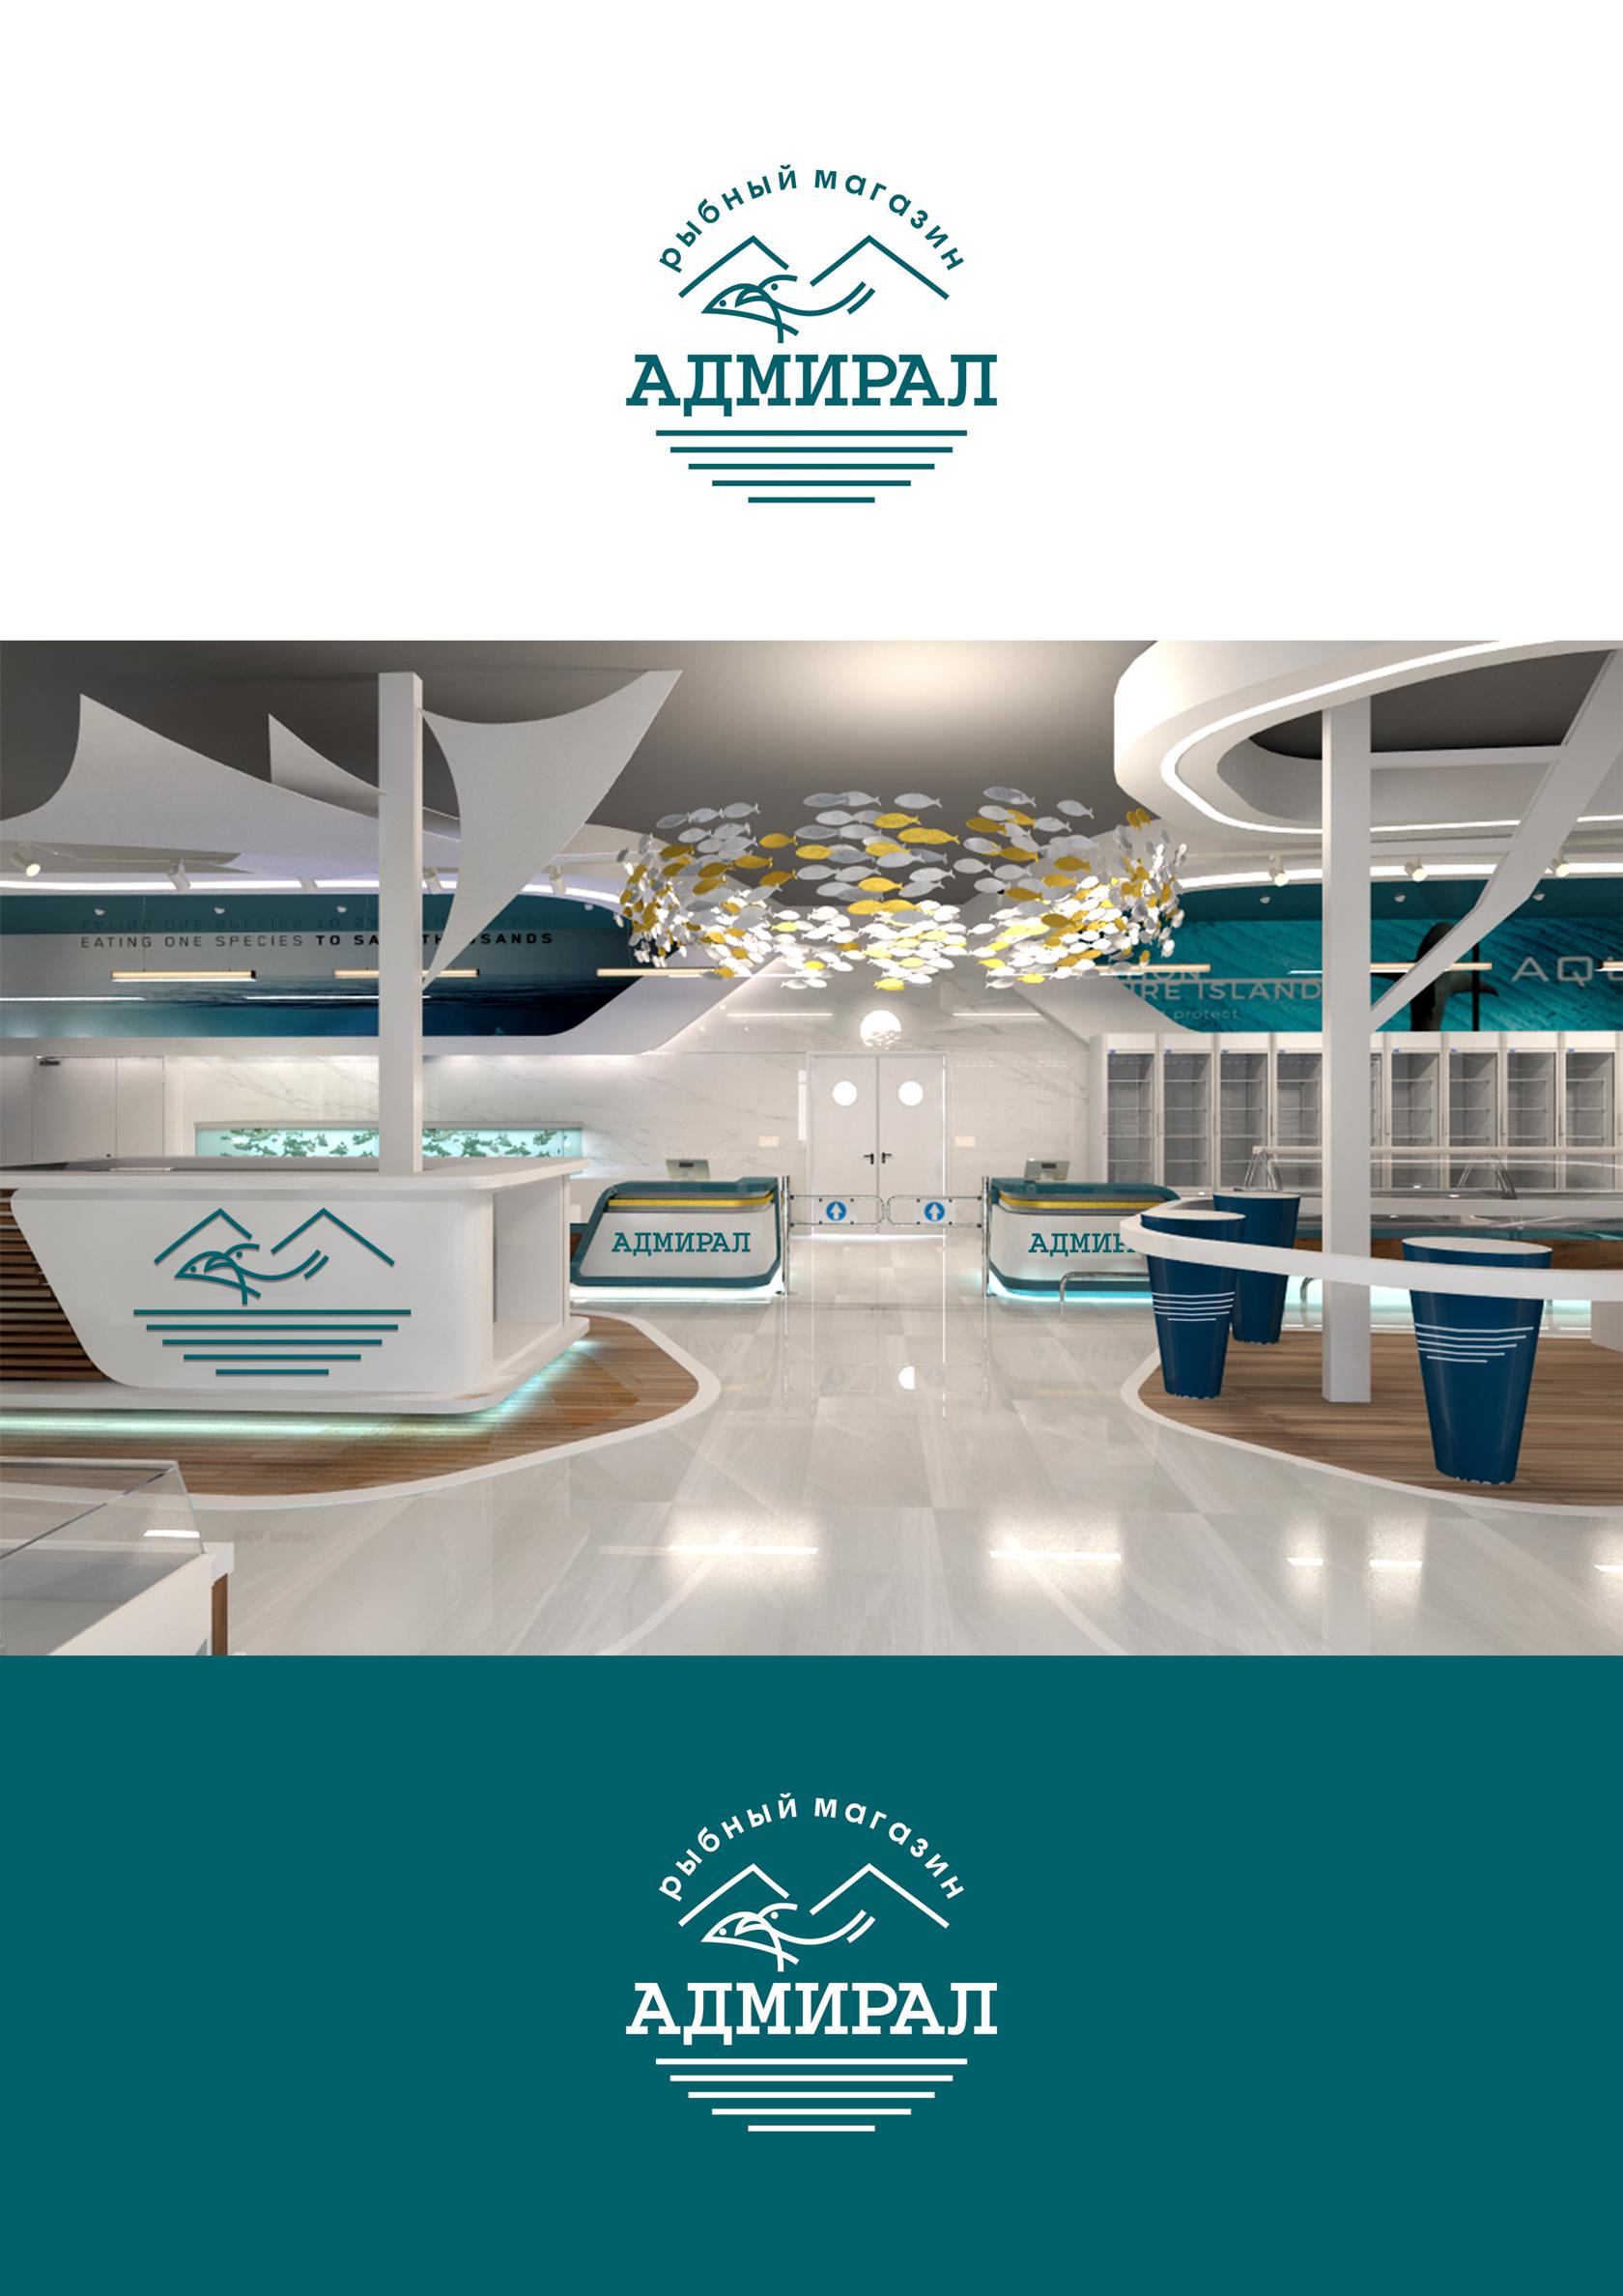 Разработка фирменного стиля для рыбного магазина фото f_8135a0ca2d923700.jpg